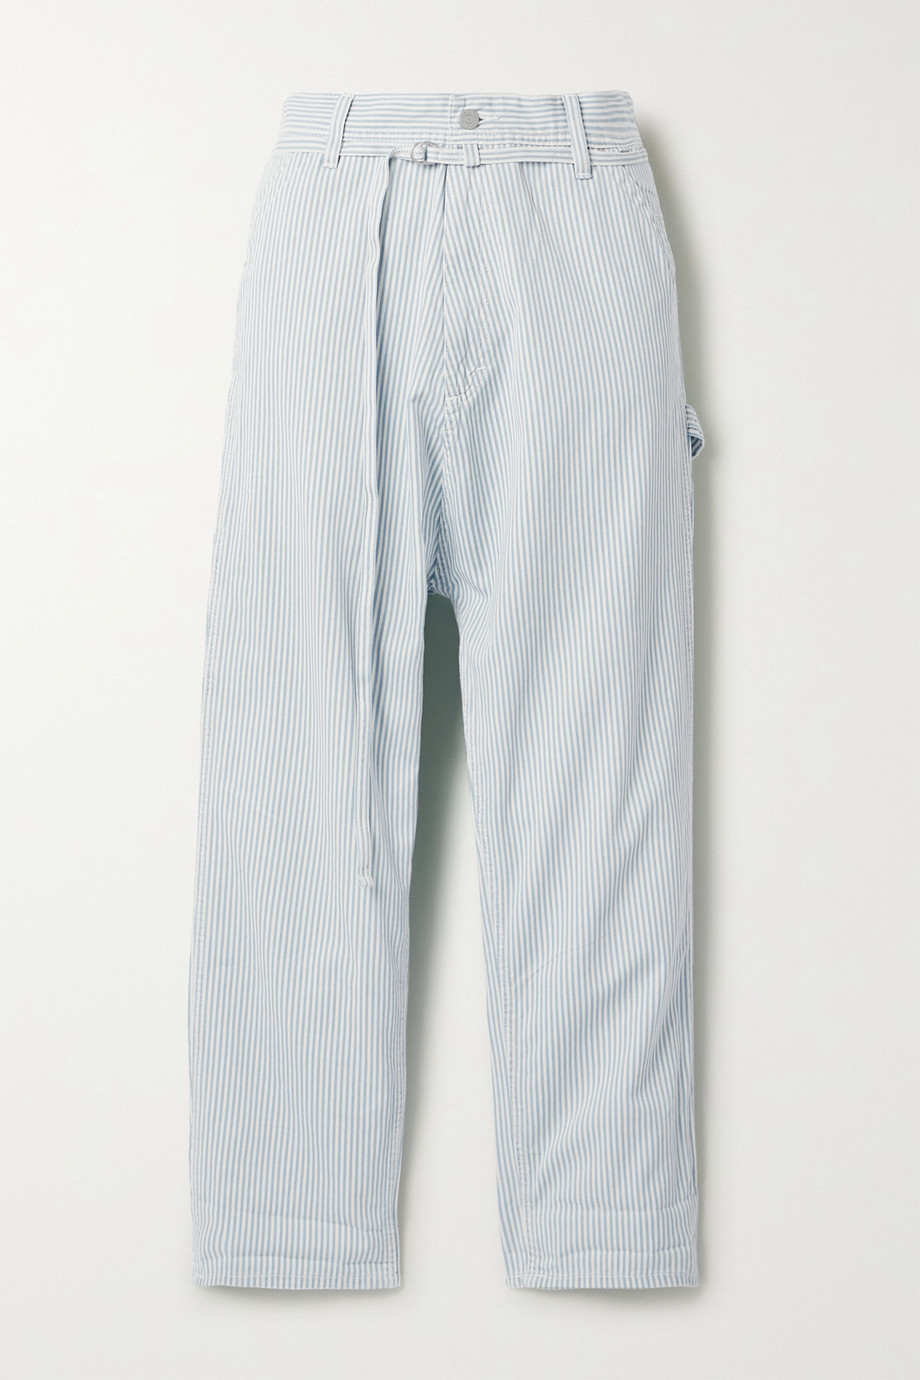 Denimist Carpenter belted striped cotton-twill pants